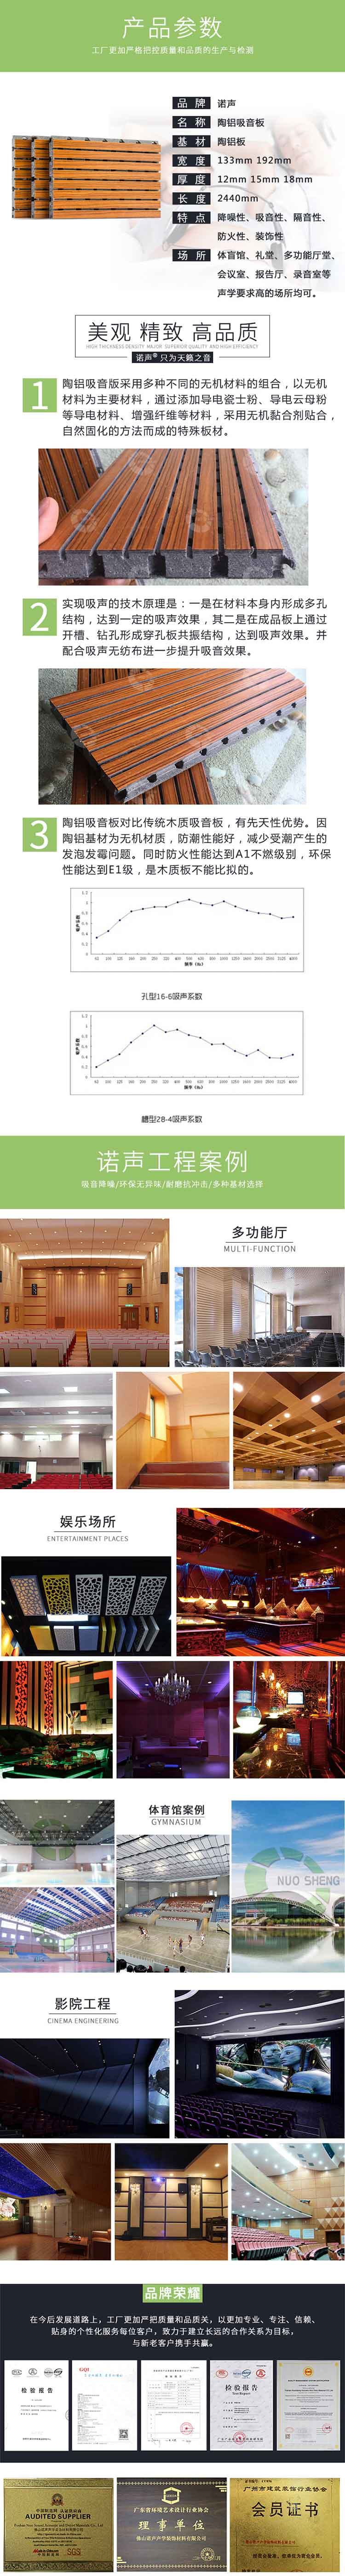 陶铝槽孔betway88必威app